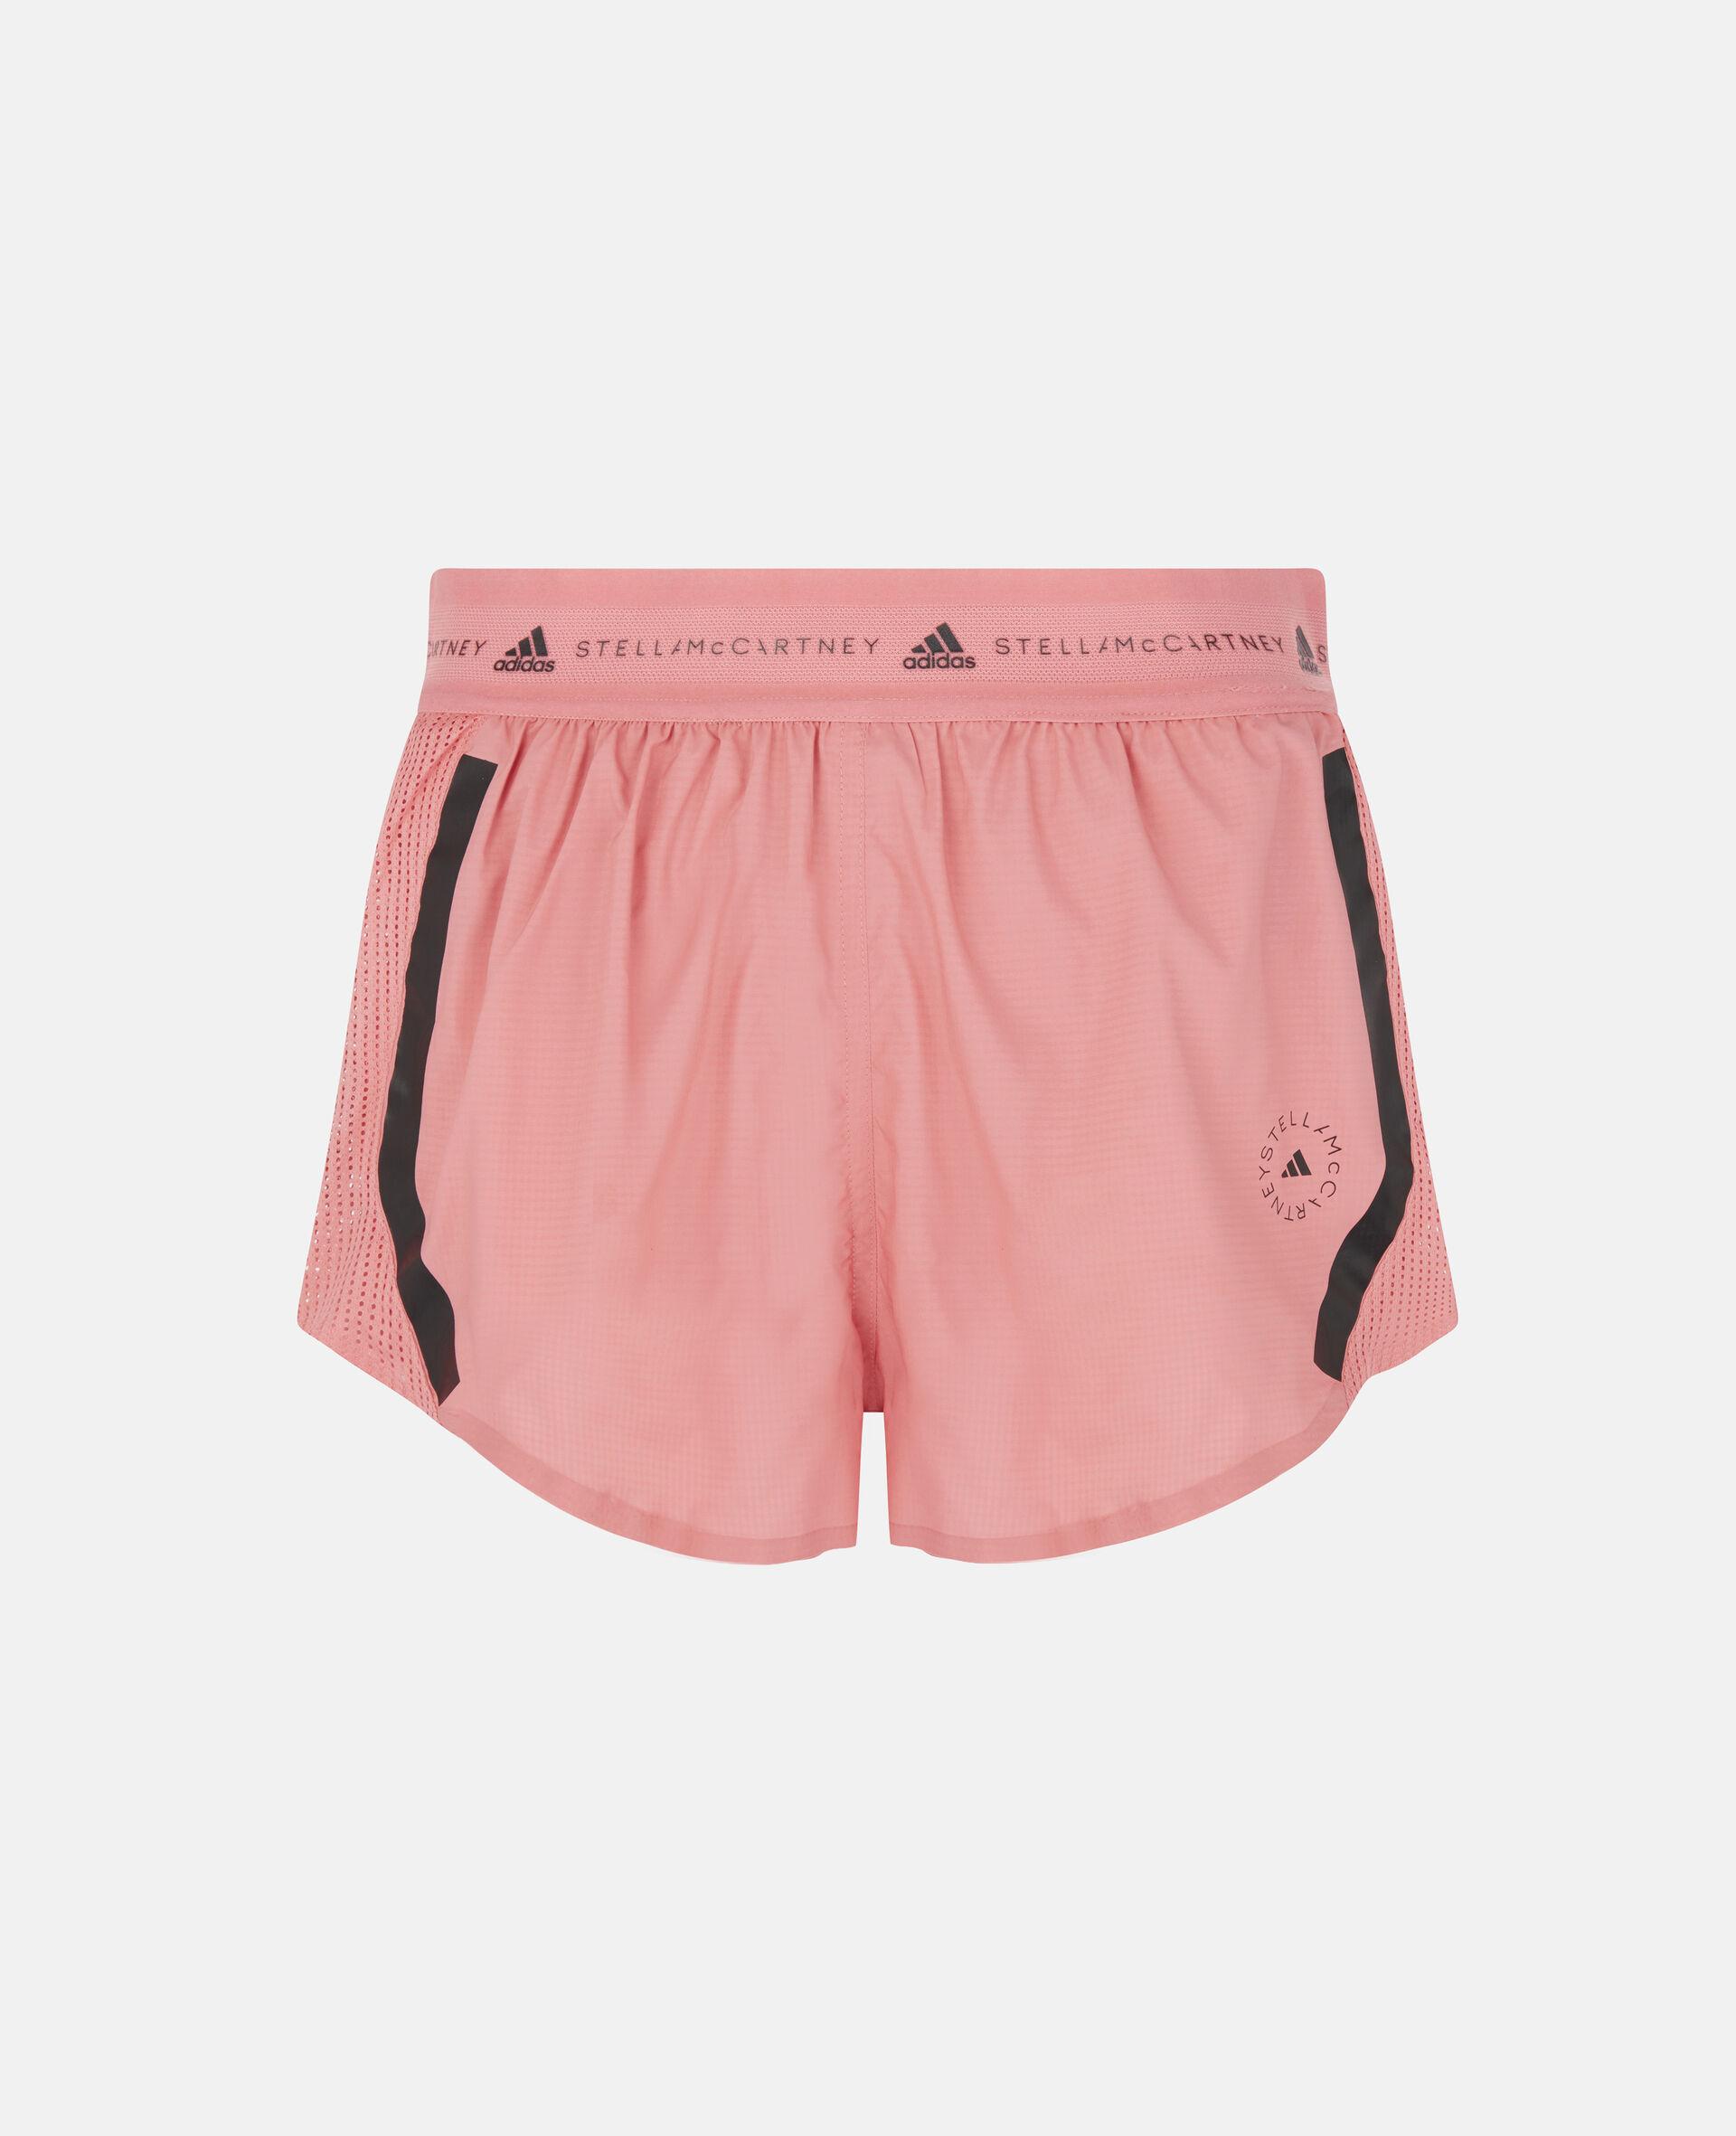 Blassrosa TruePurpose Trainings-Shorts-Rose-large image number 0